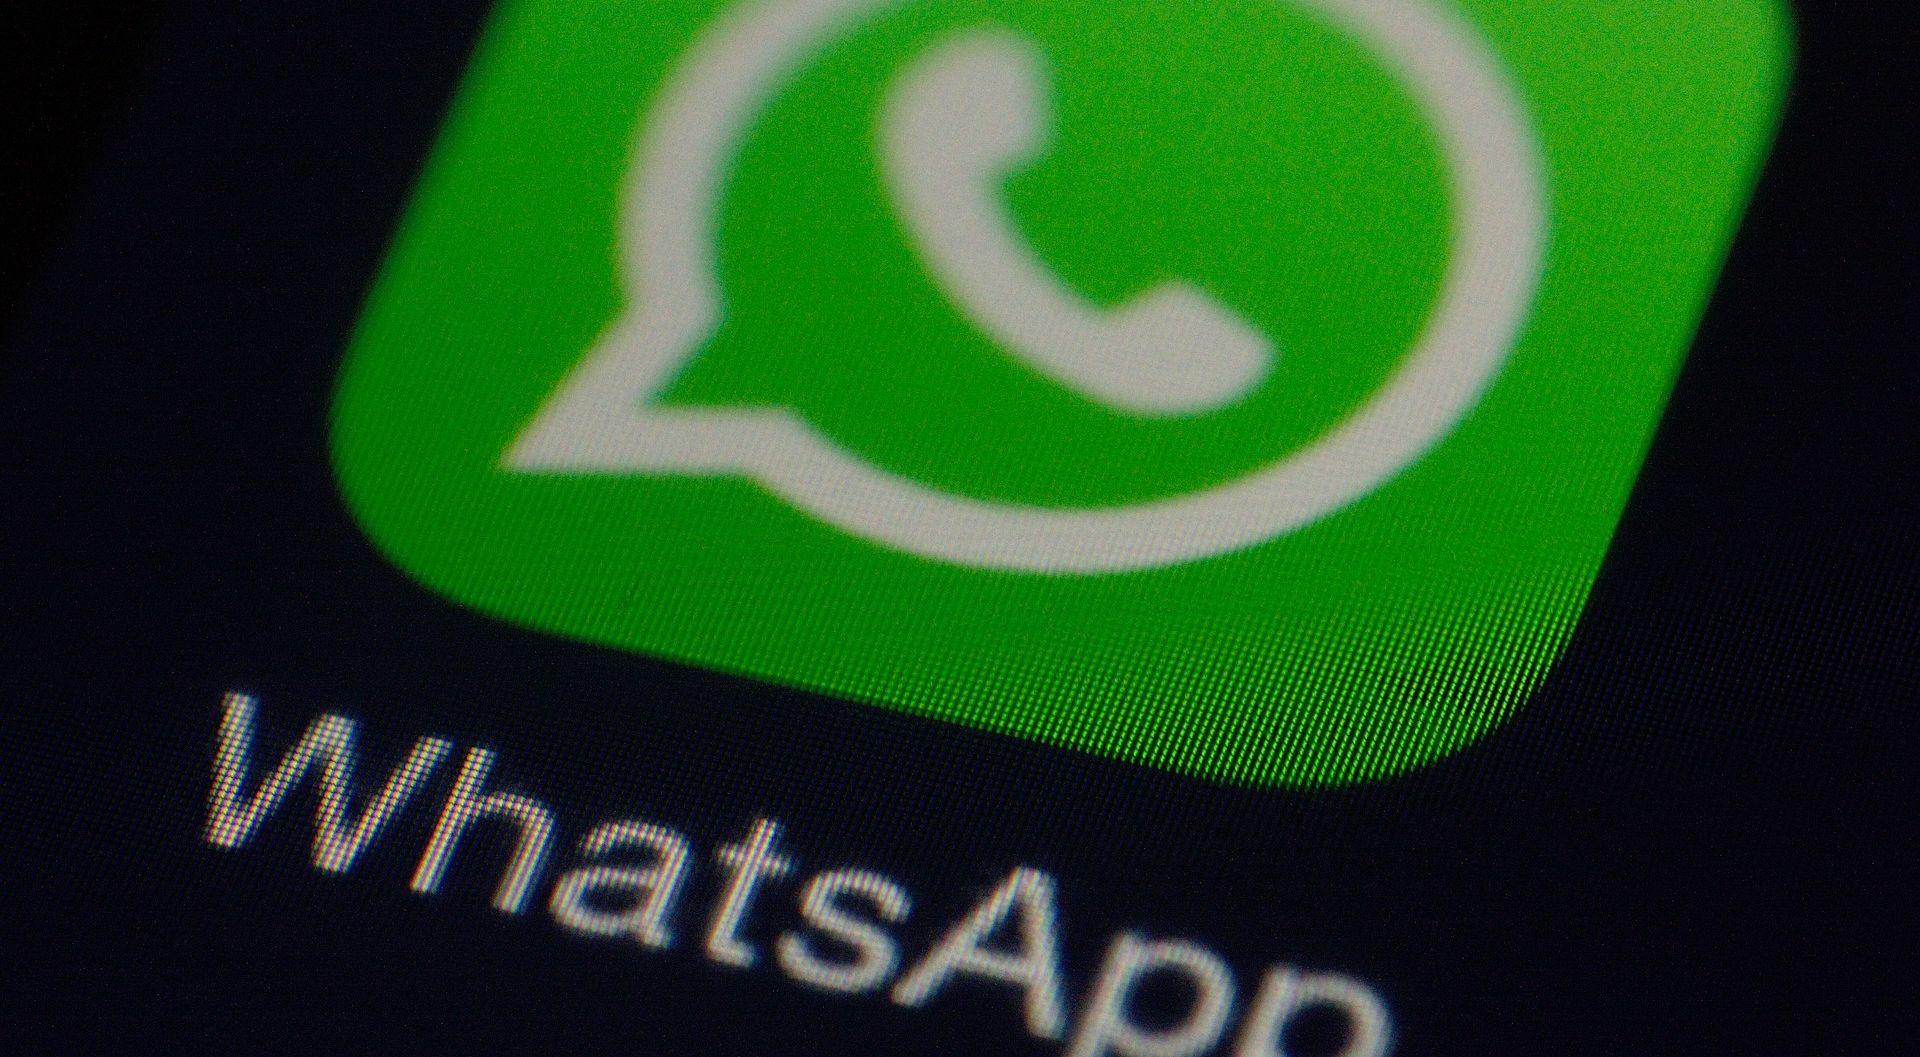 SIGURNOSNI PROPUST Opasnost za 200 milijuna korisnika WhatsAppa